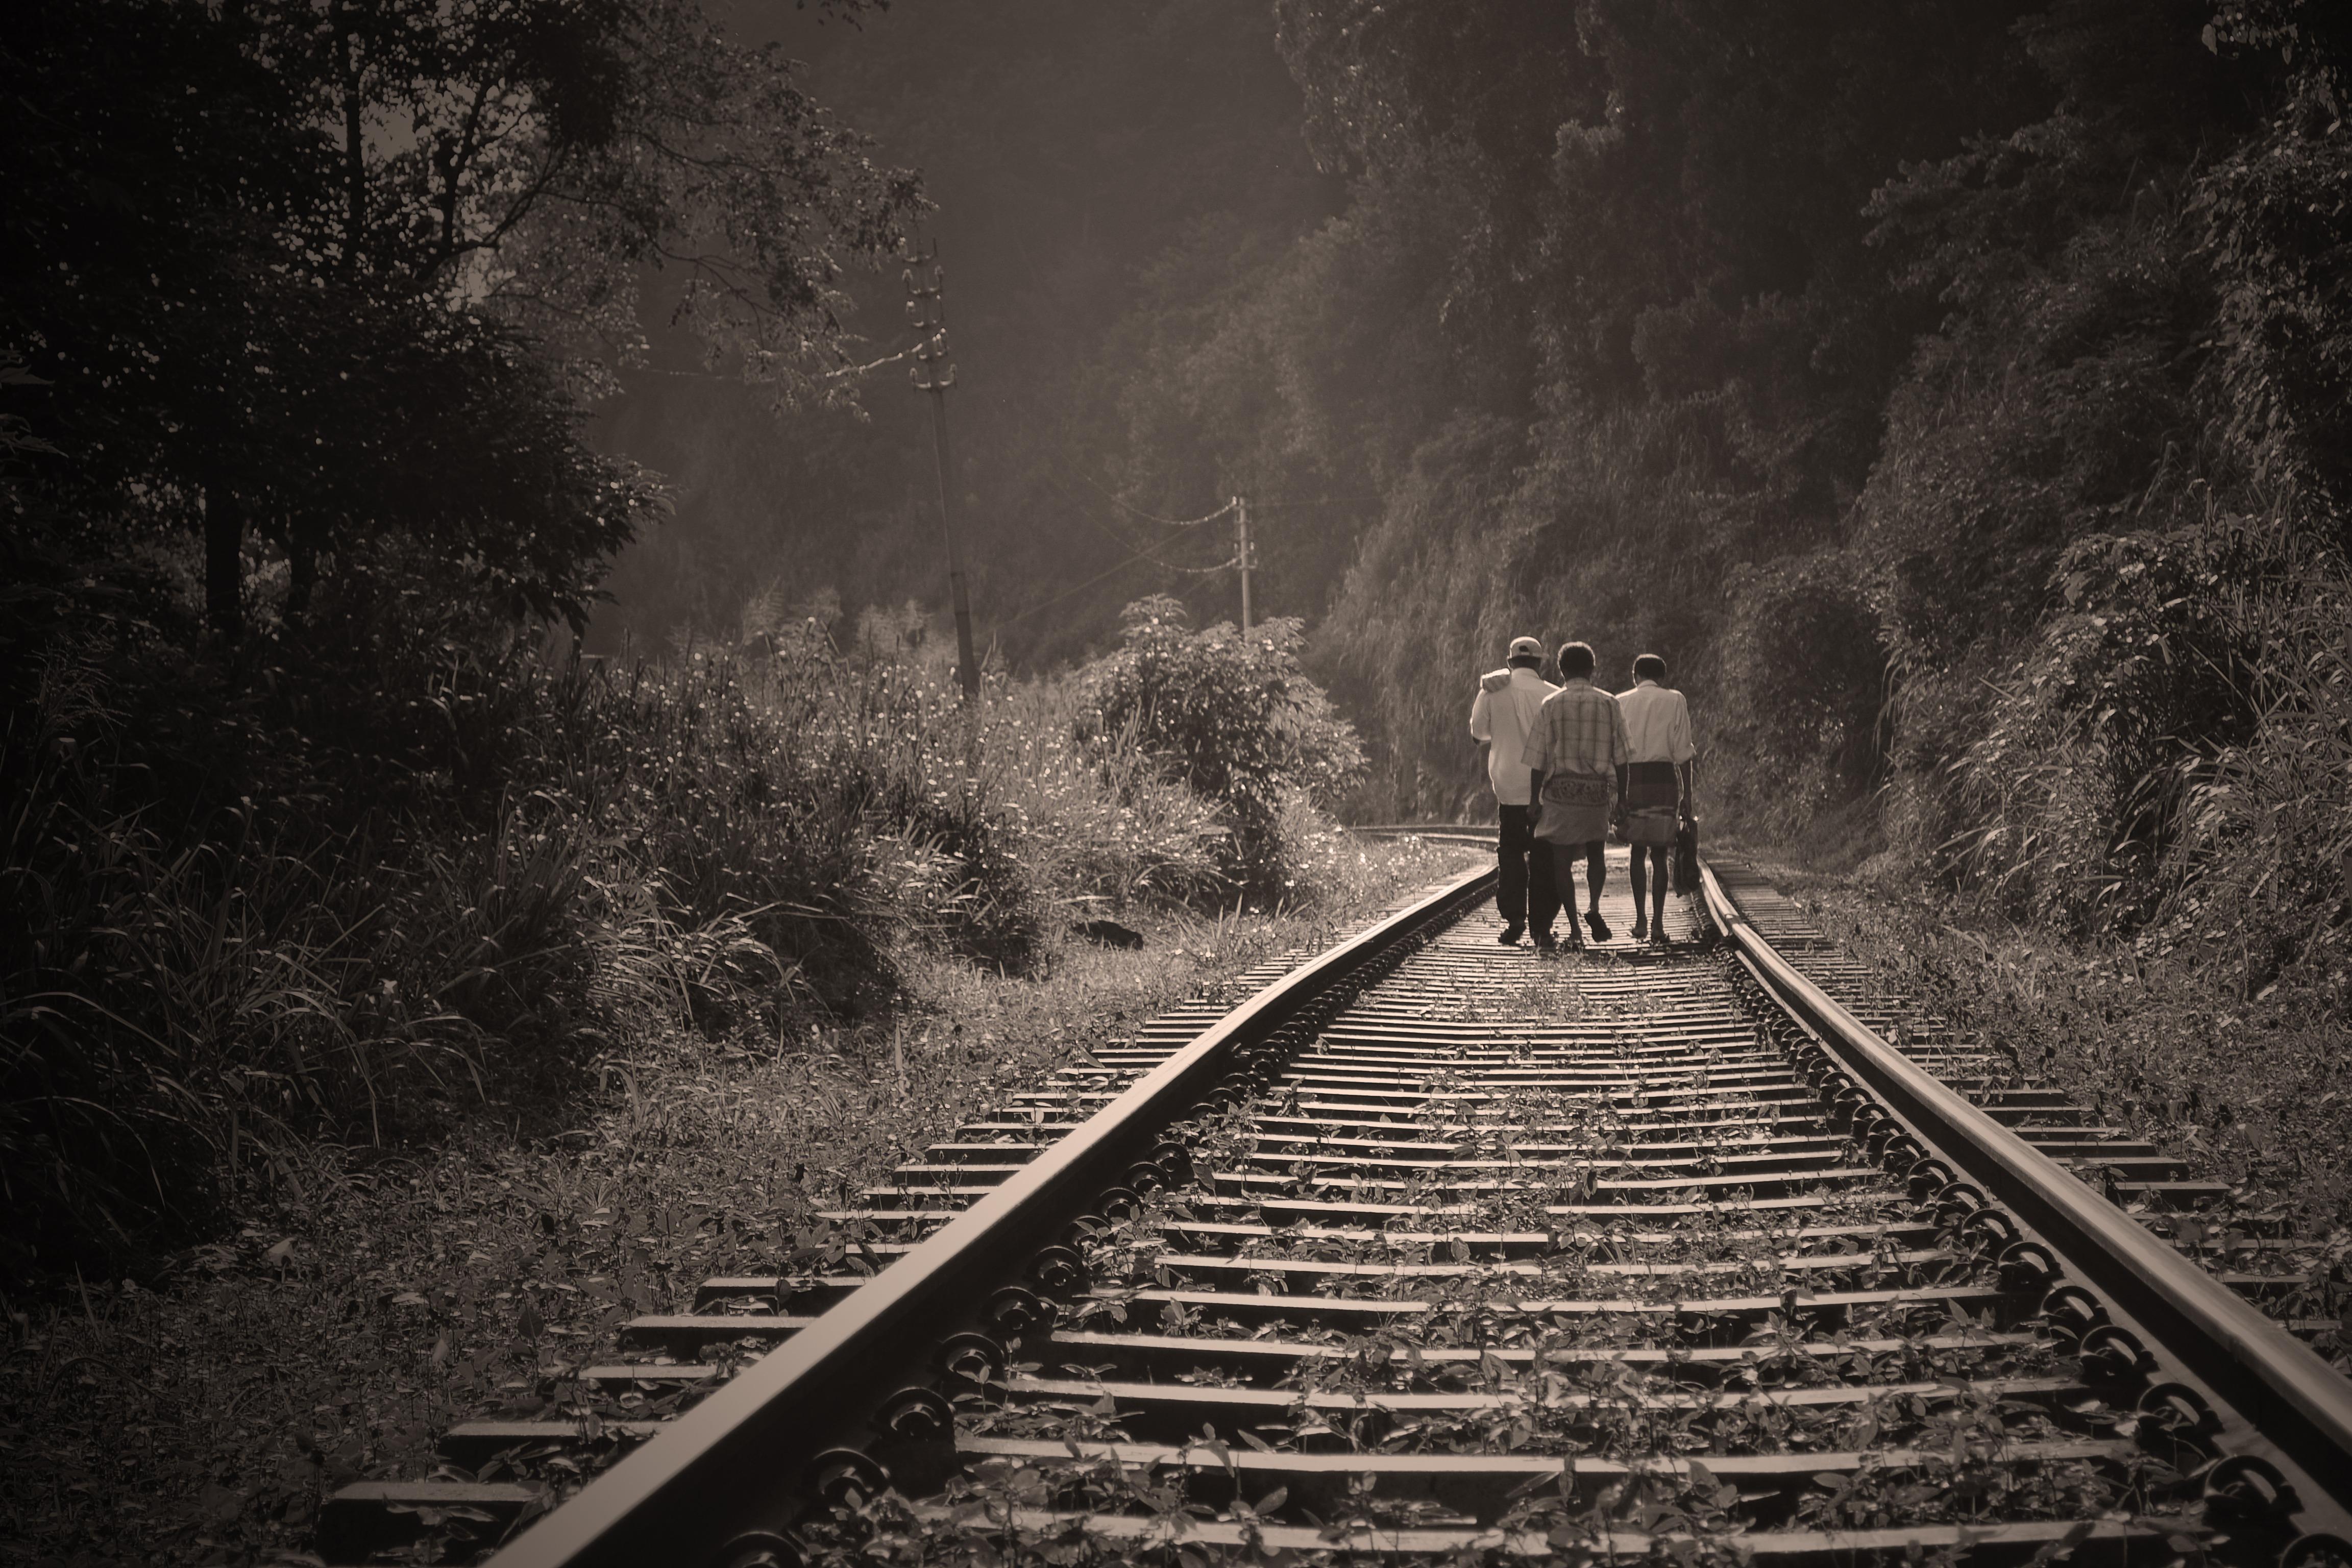 железная дорога и люди картинки менее